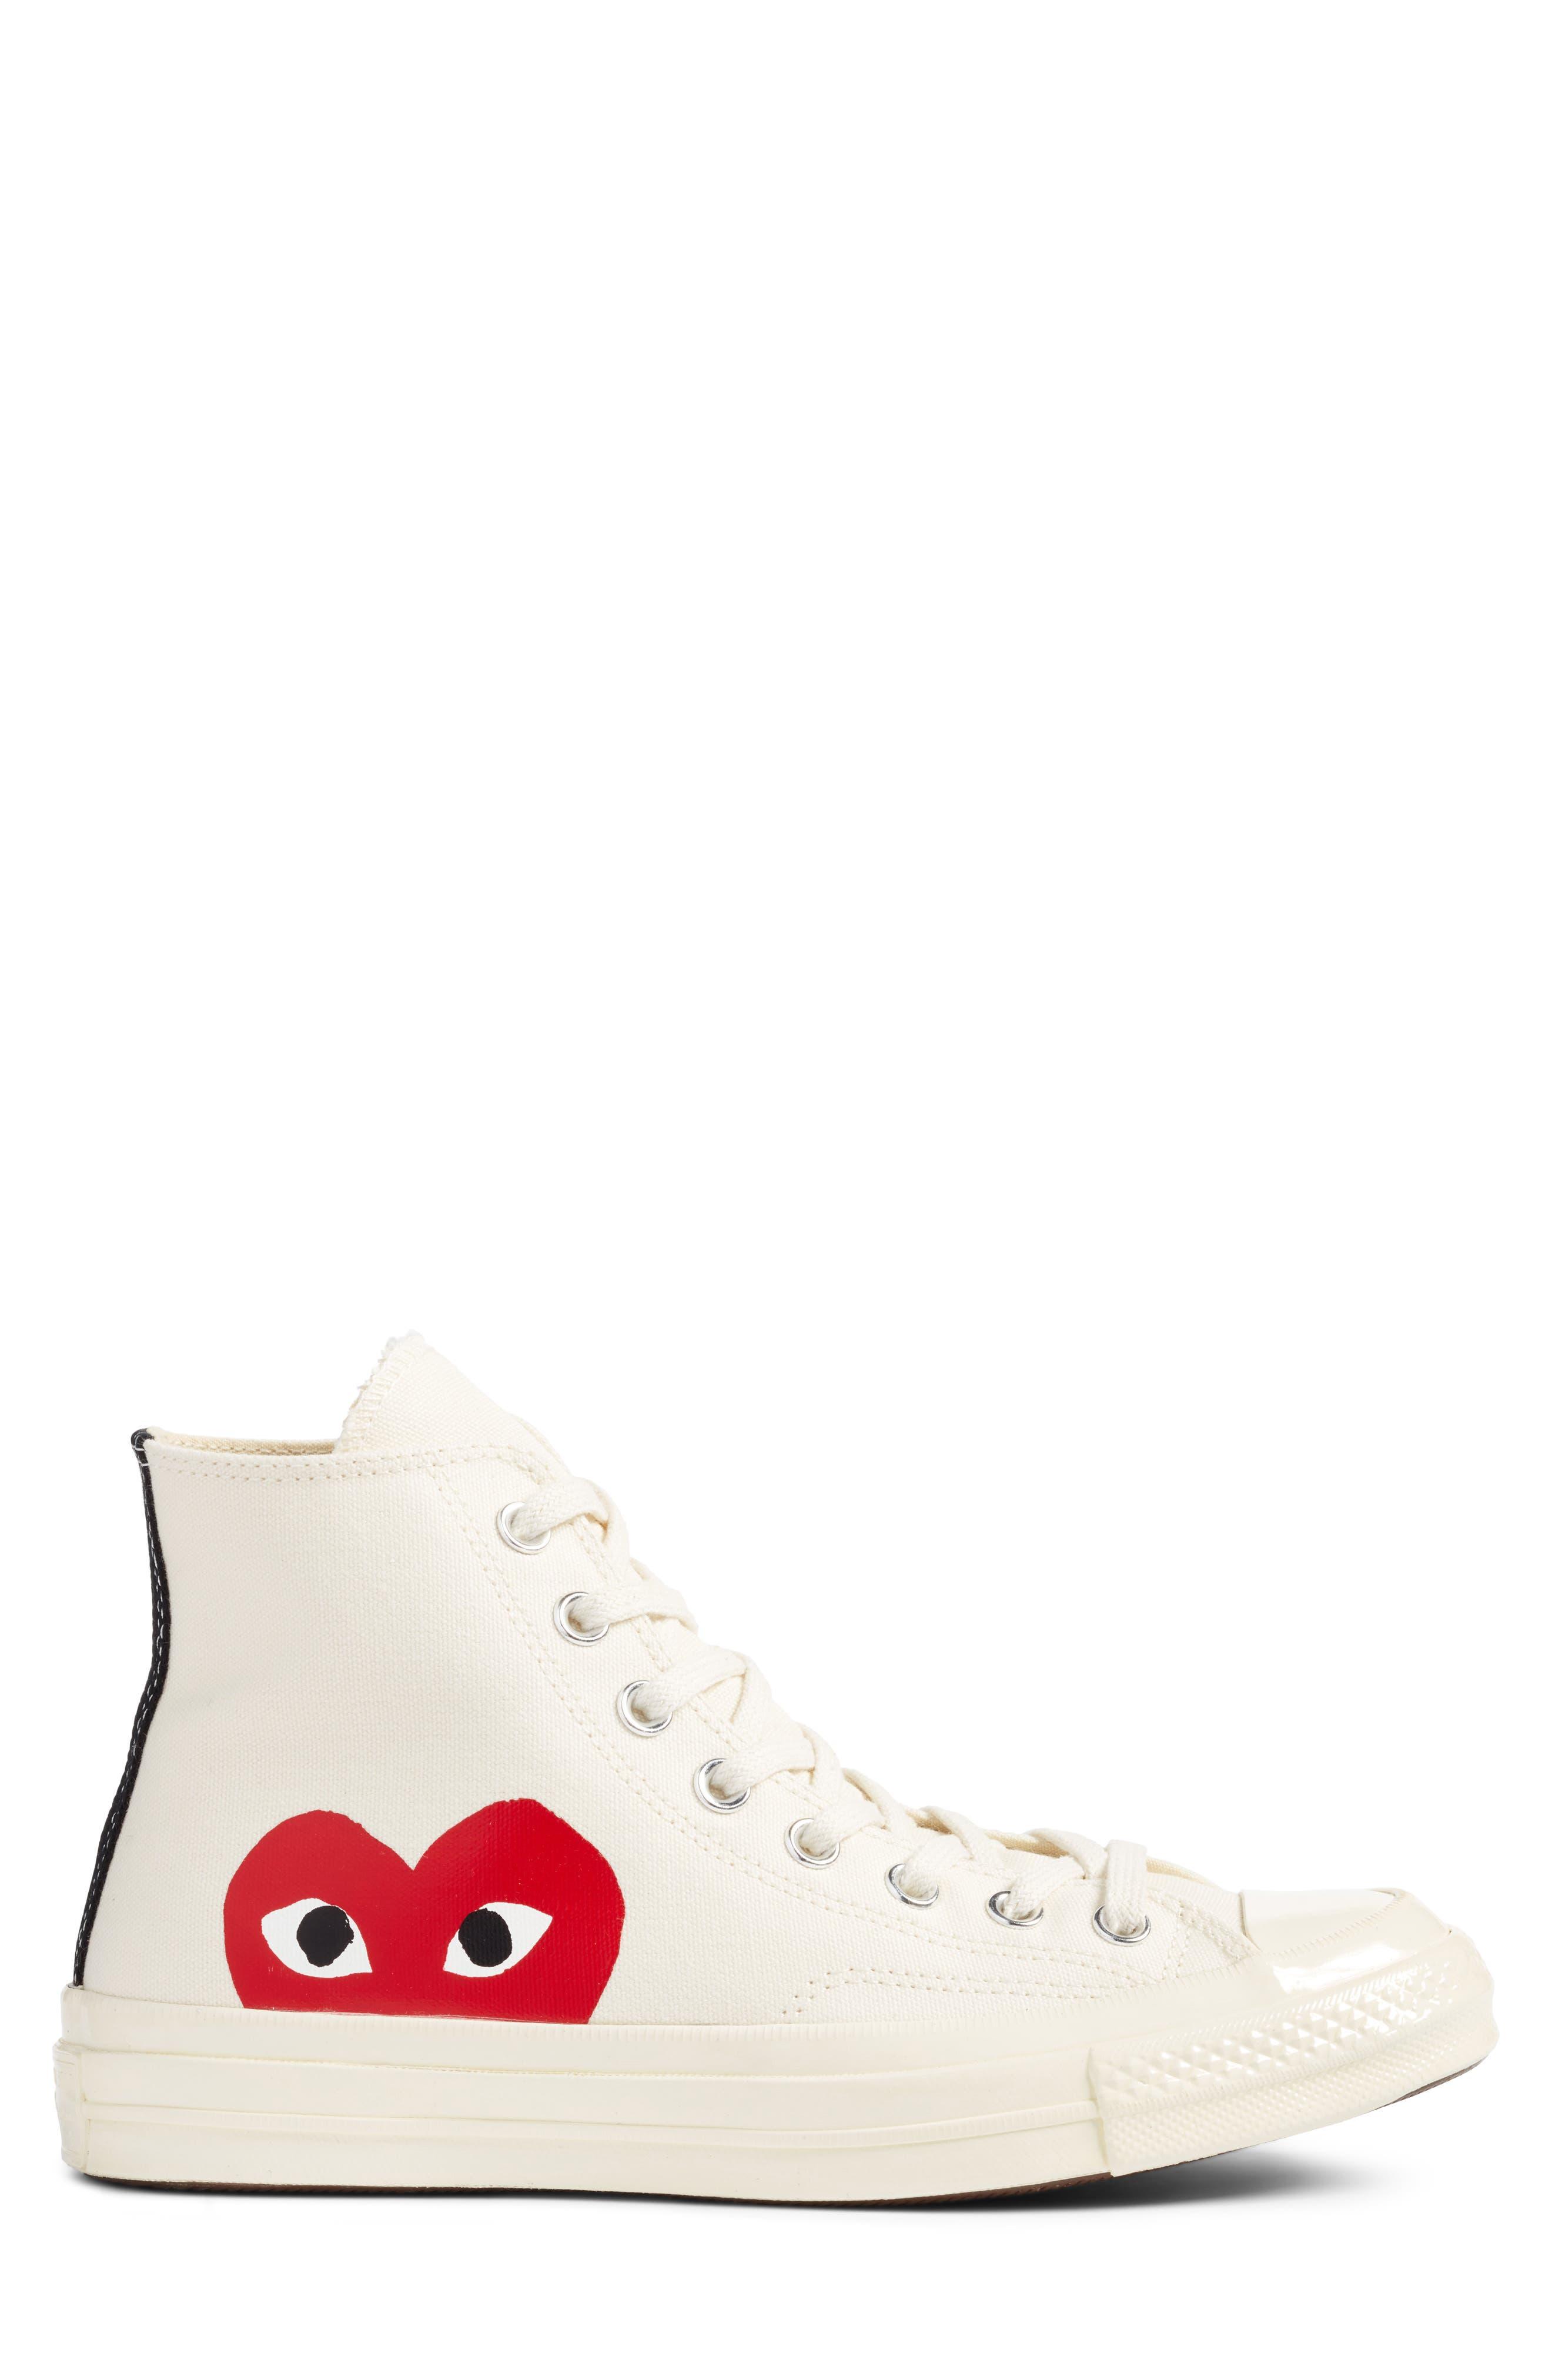 PLAYx Converse Chuck Taylor<sup>®</sup> - Hidden Heart High TopSneaker,                             Alternate thumbnail 3, color,                             WHITE CANVAS